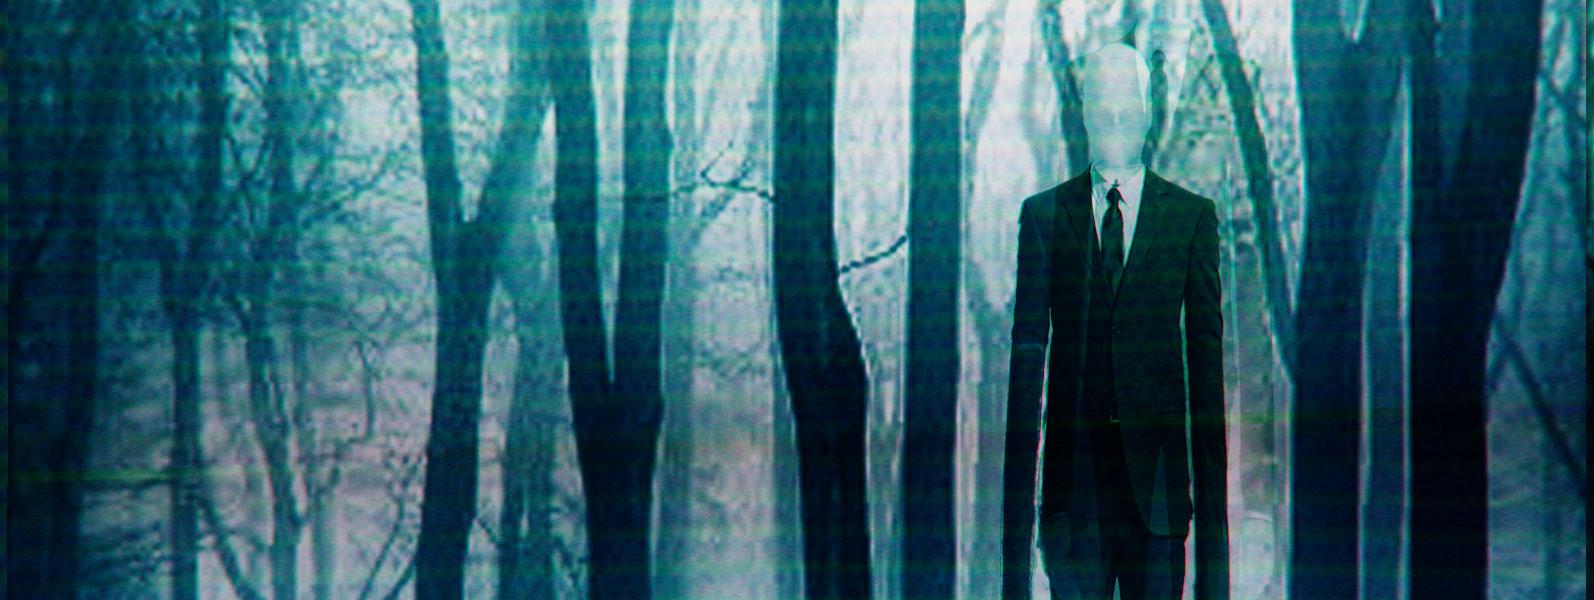 De man zonder gezicht - Andreas Palmaer